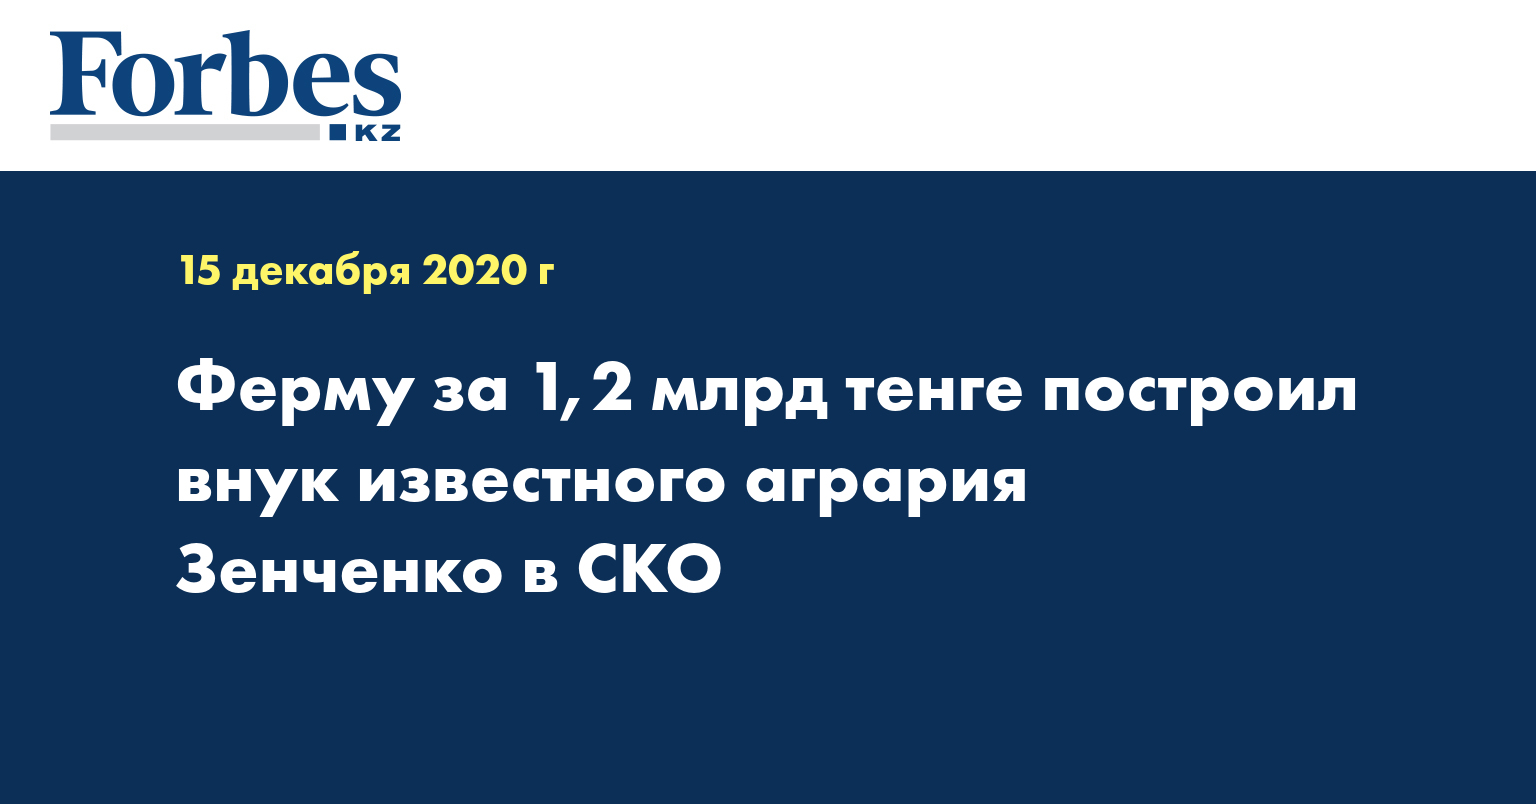 Ферму за 1,2 млрд тенге построил внук известного агрария Зенченко в СКО